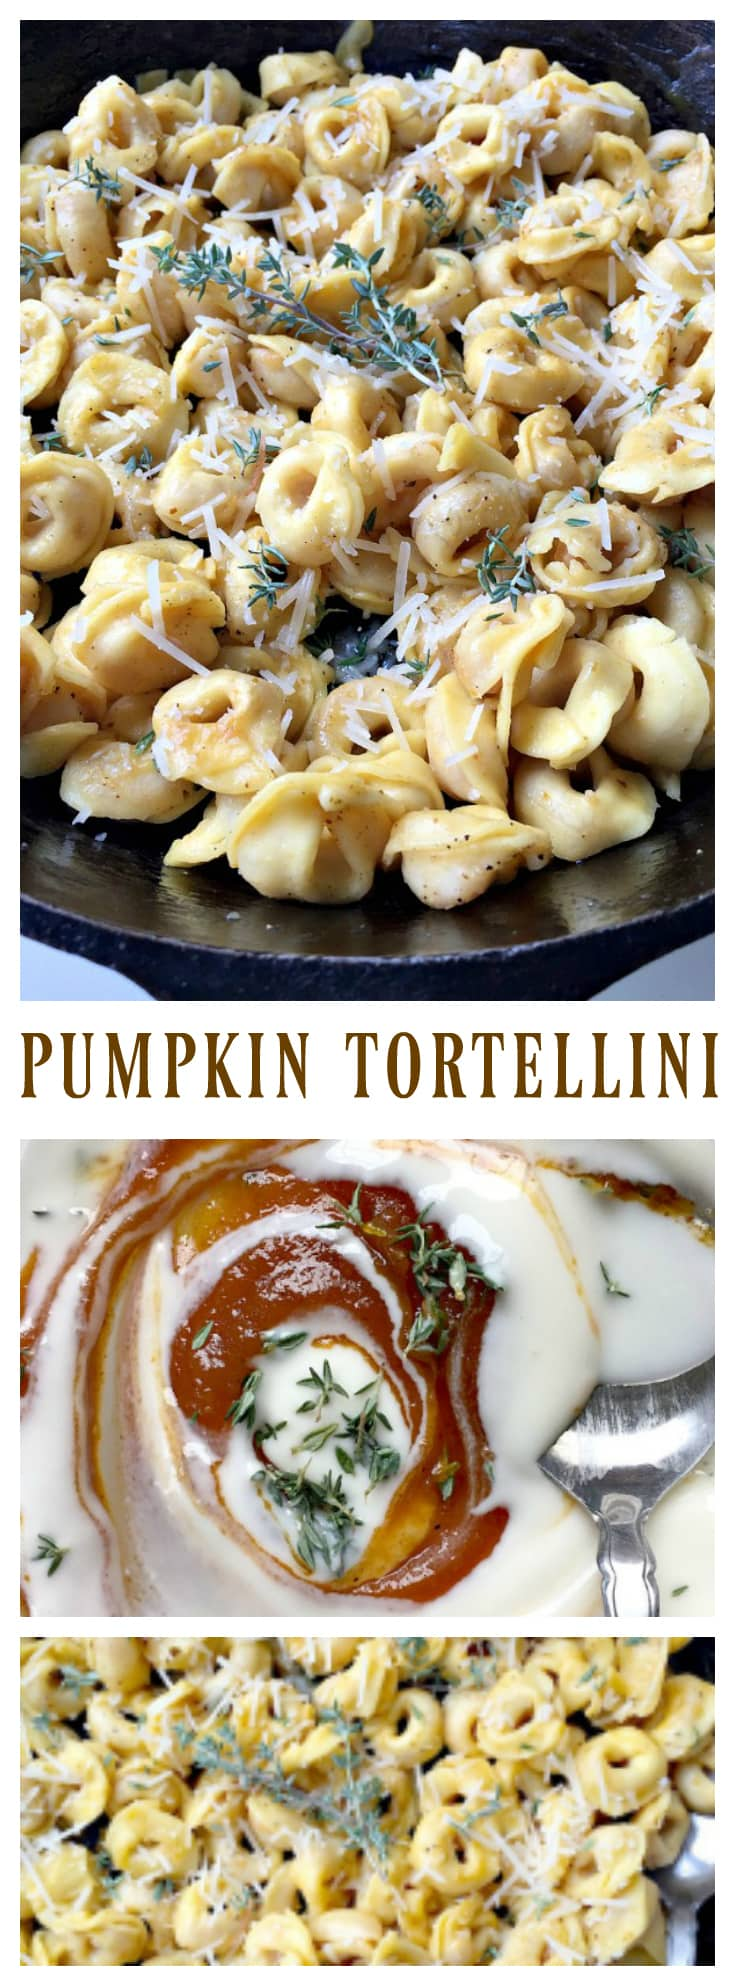 Pumpkin Tortellini for fall time entertaining!